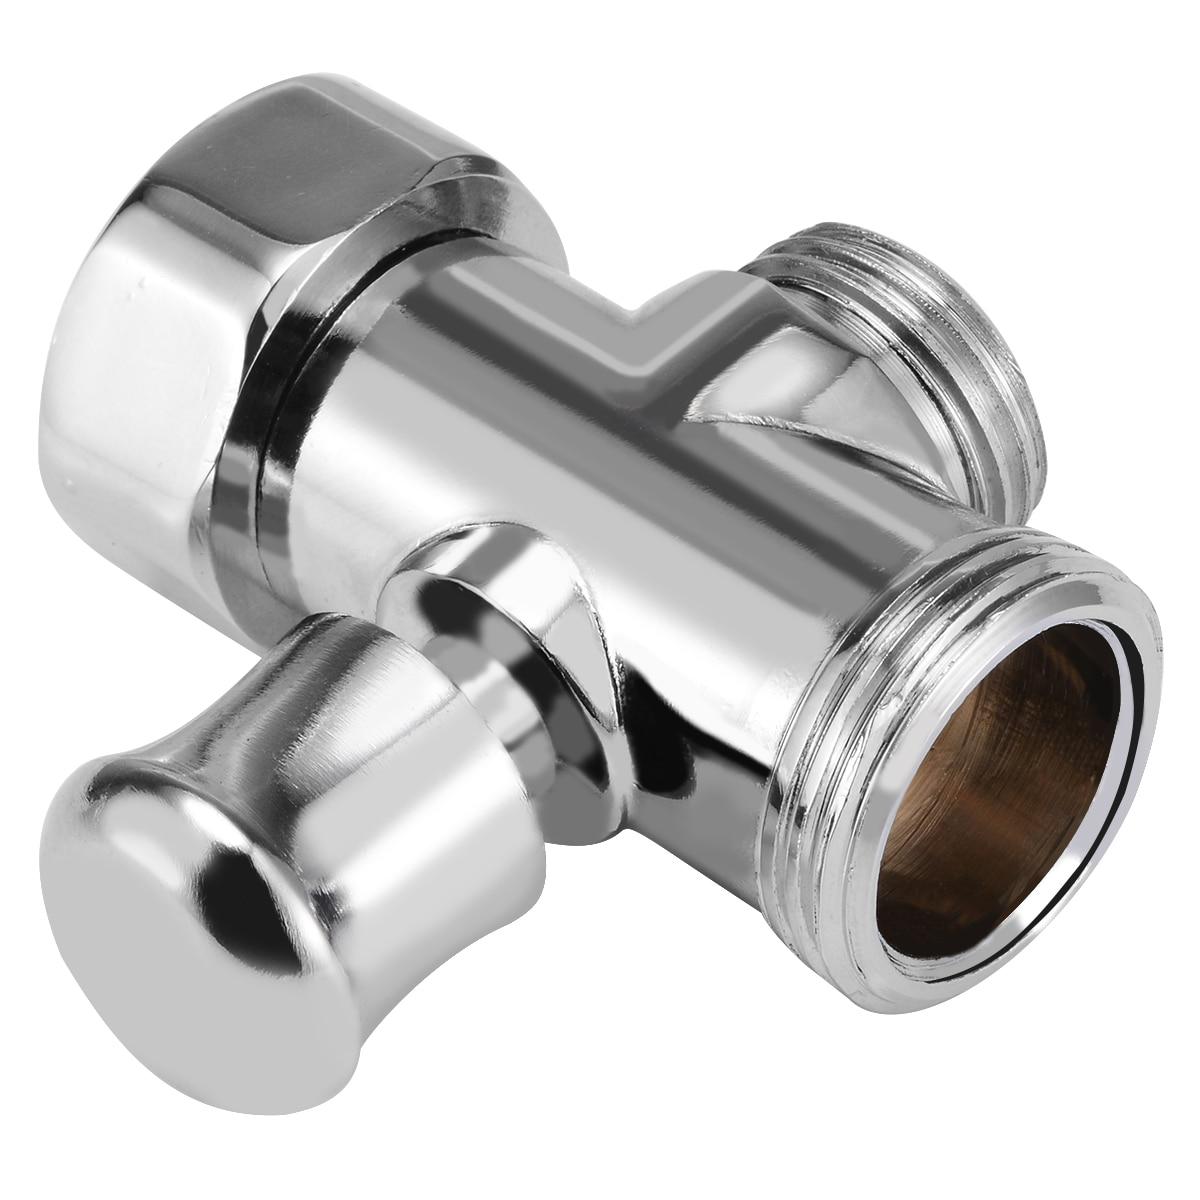 3 Way Bathroom Toilet Bidet 3/4'' & 1/2'' BSP T-adapter Shower Diverter Valve Shower Head For Toilet Bidet Shower Bathroom Tool bathroom shower page 1